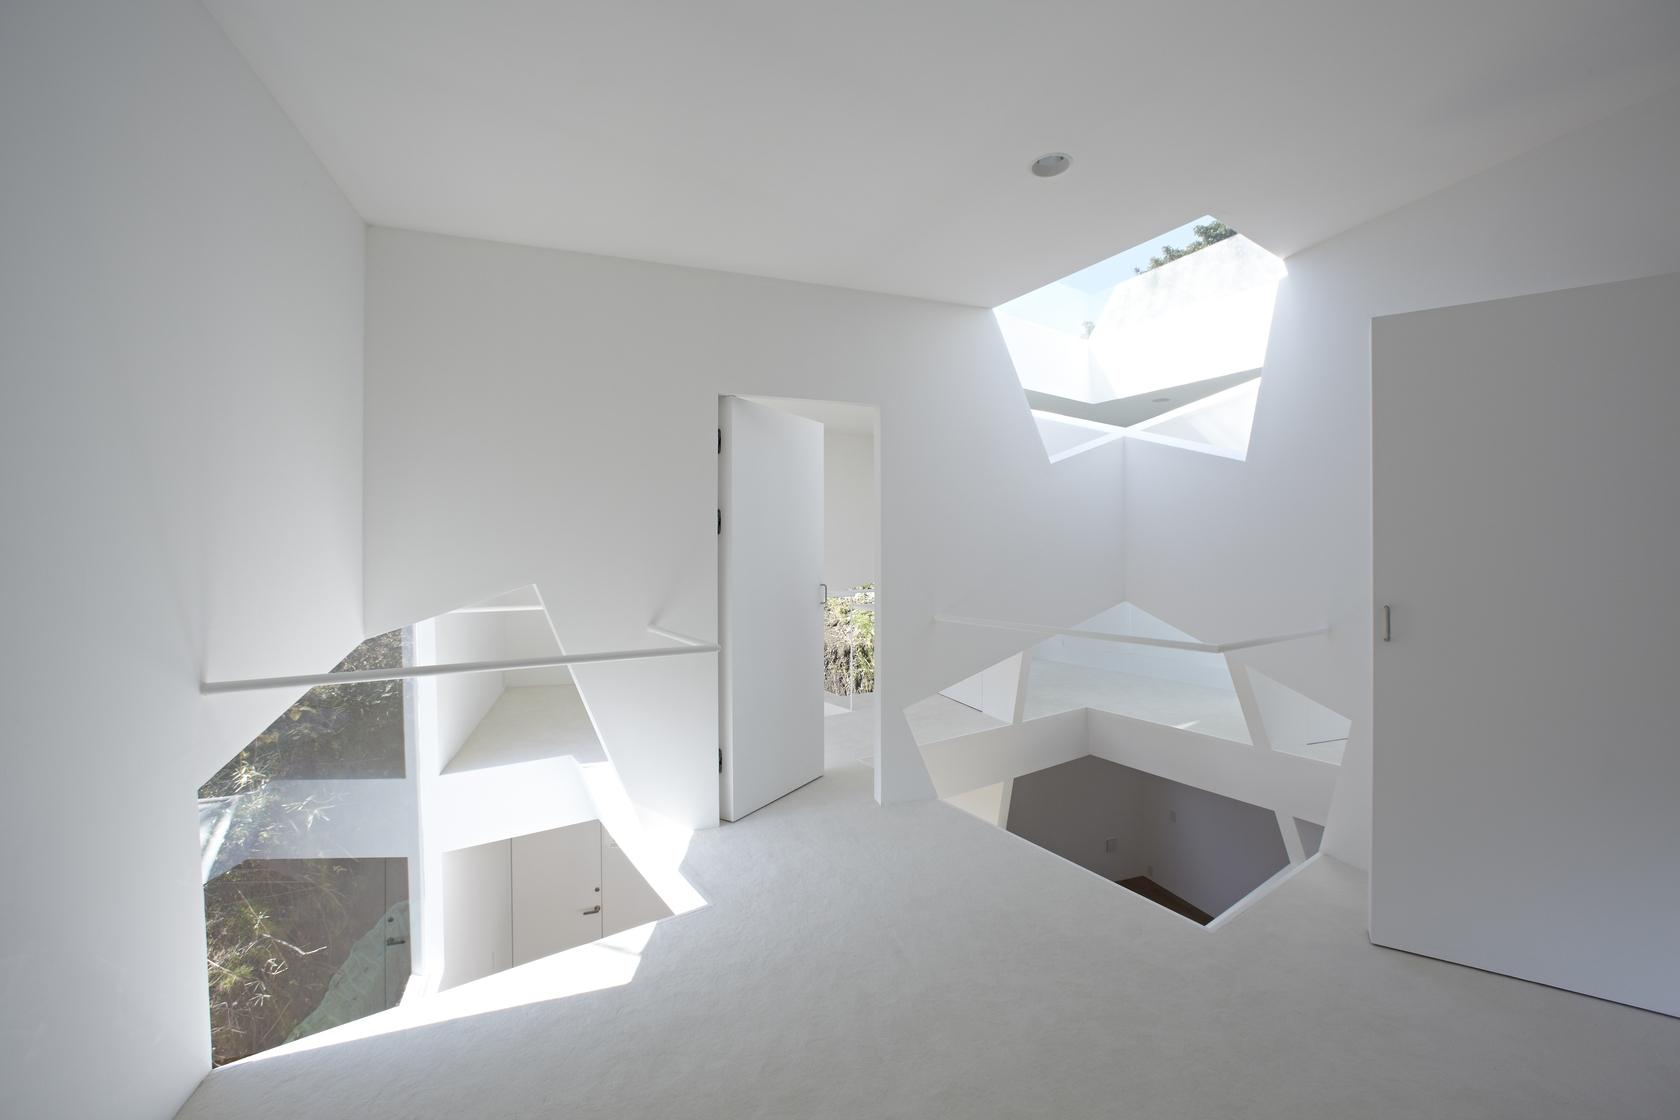 creative skylights  Interior Design Ideas